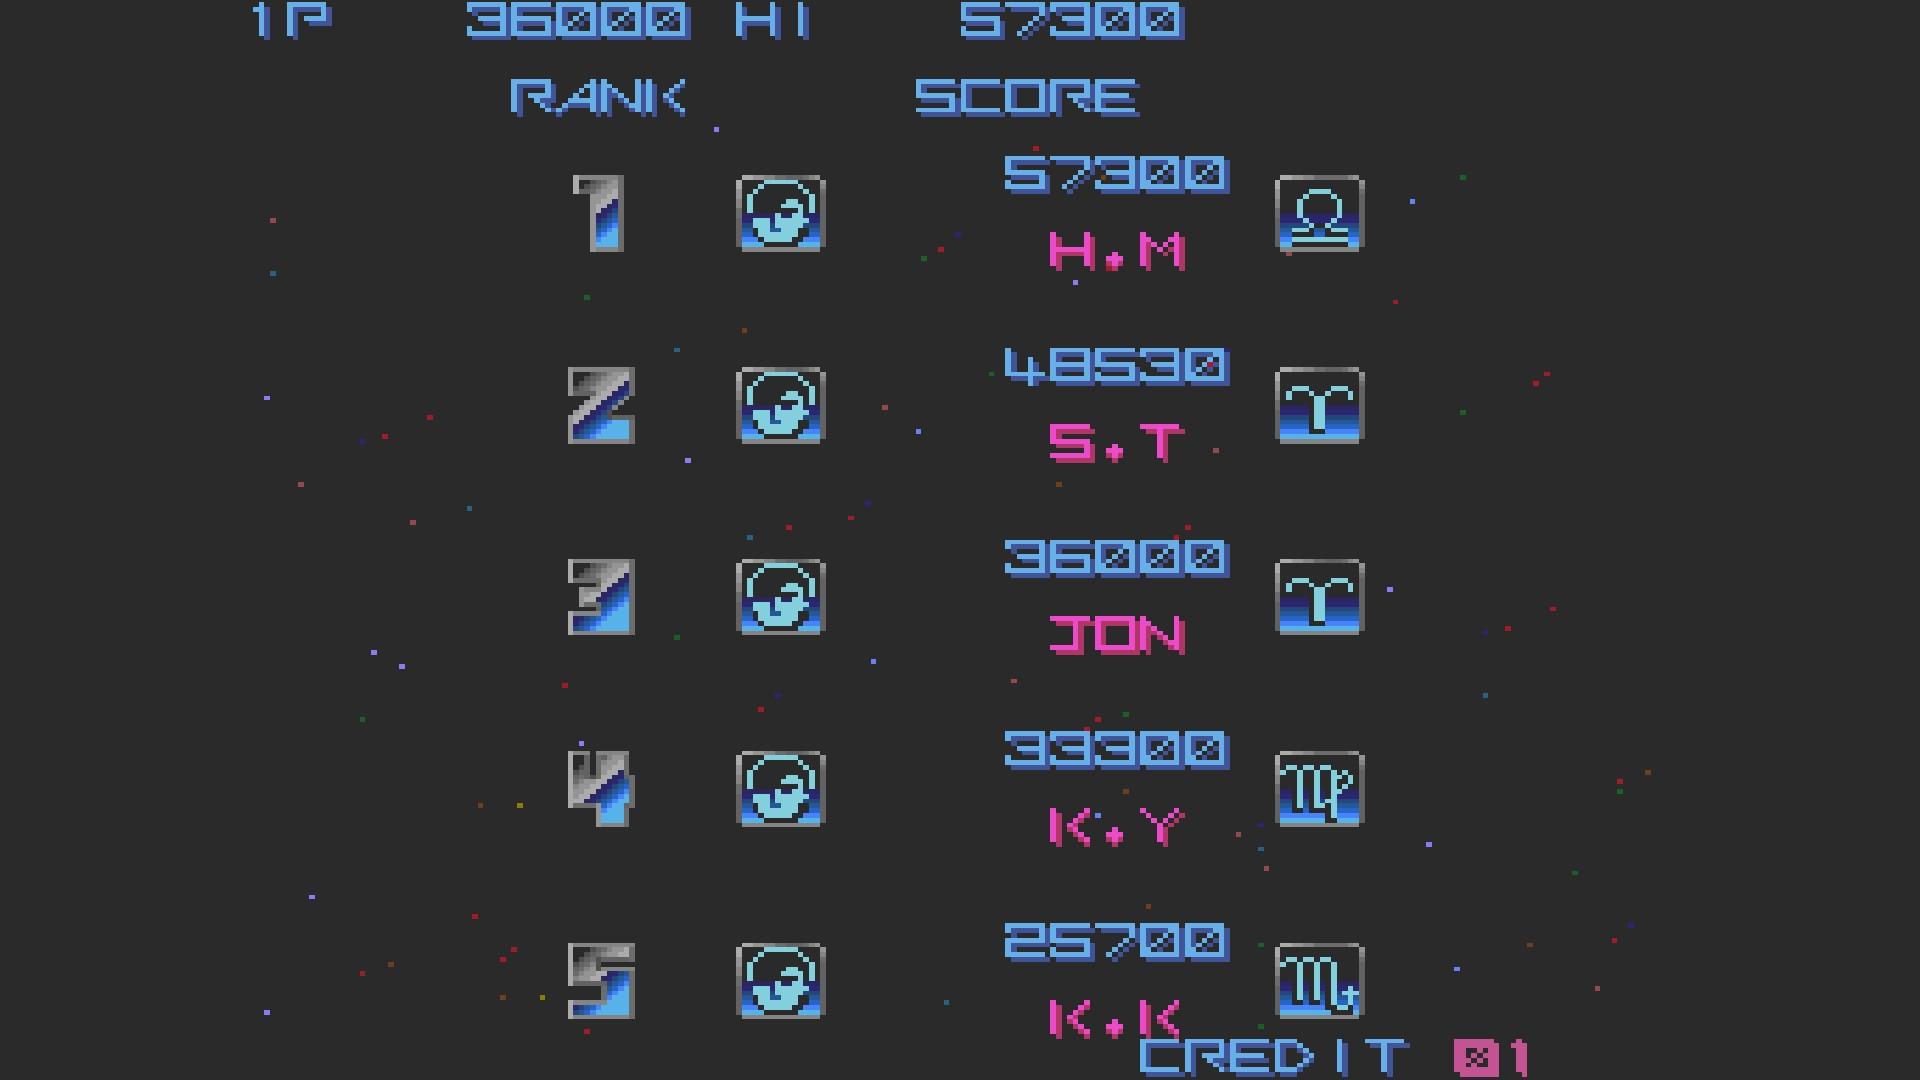 AkinNahtanoj: Nemesis [nemesis] (Arcade Emulated / M.A.M.E.) 36,000 points on 2020-12-27 15:35:01